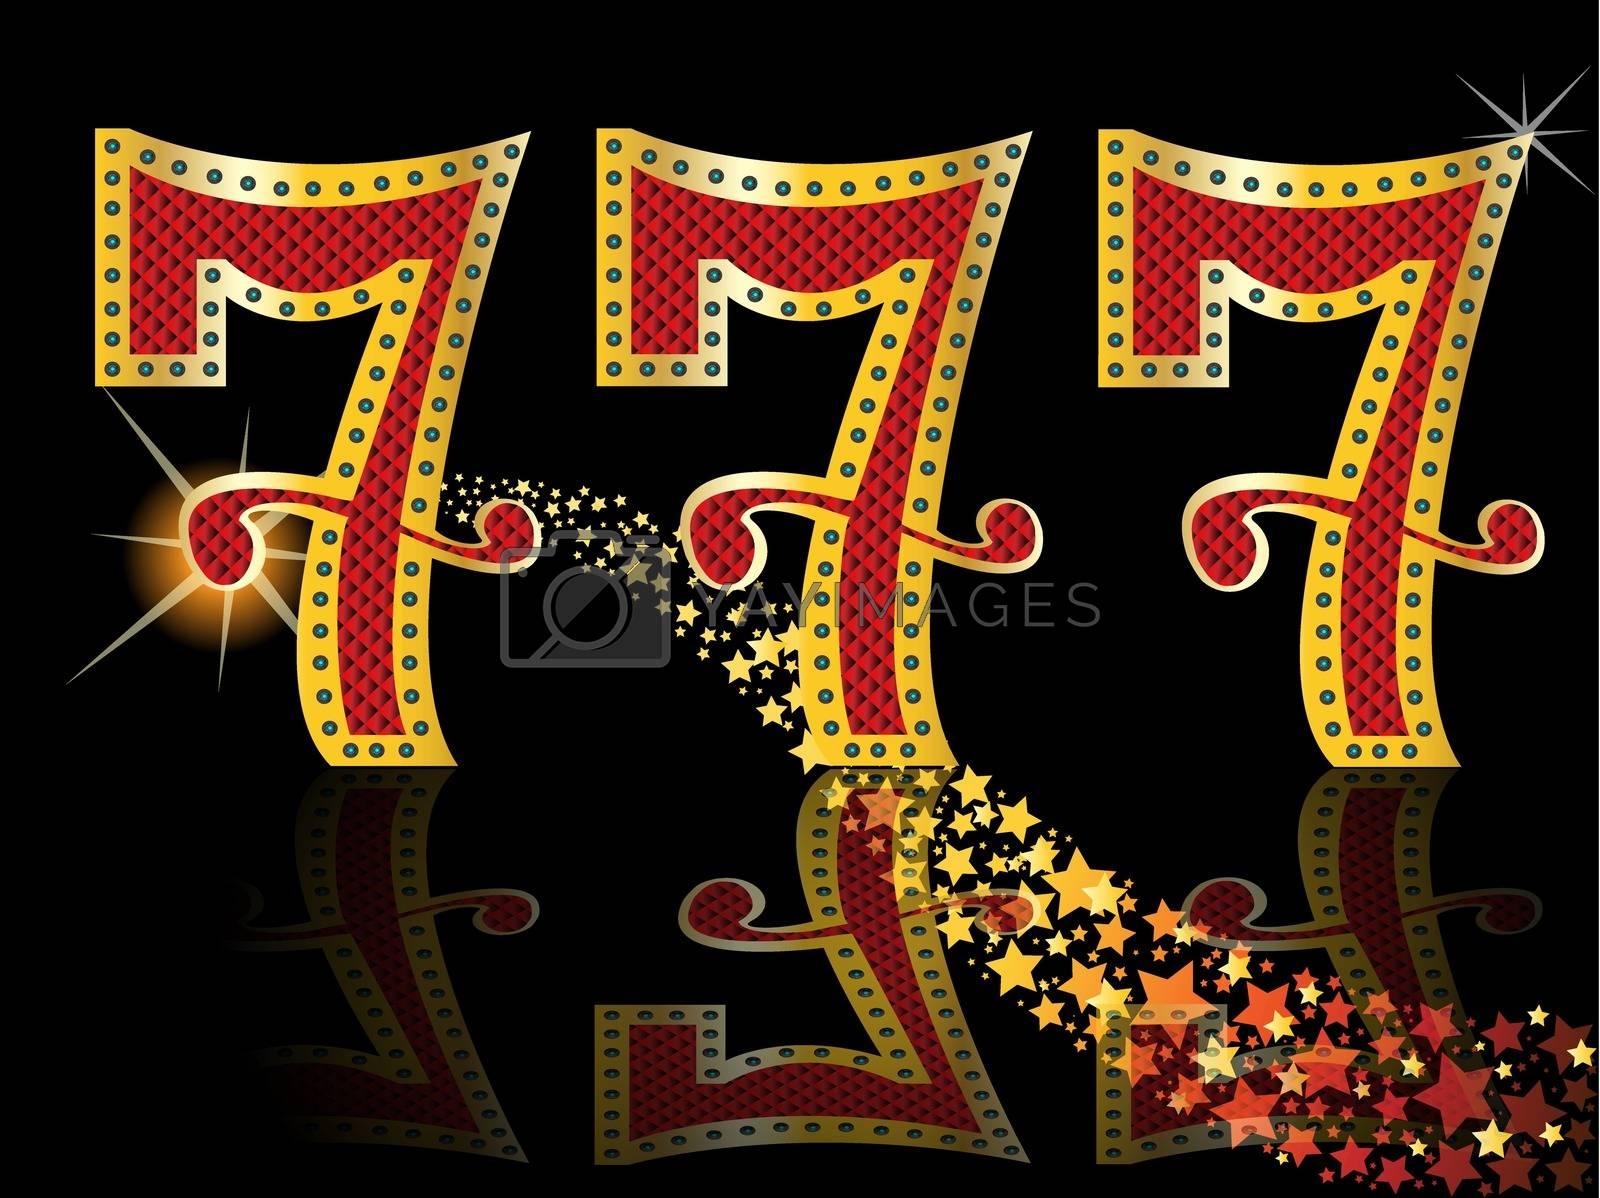 777 Casino Slot Design Lucky Seven Slot Machine Font Royalty Free